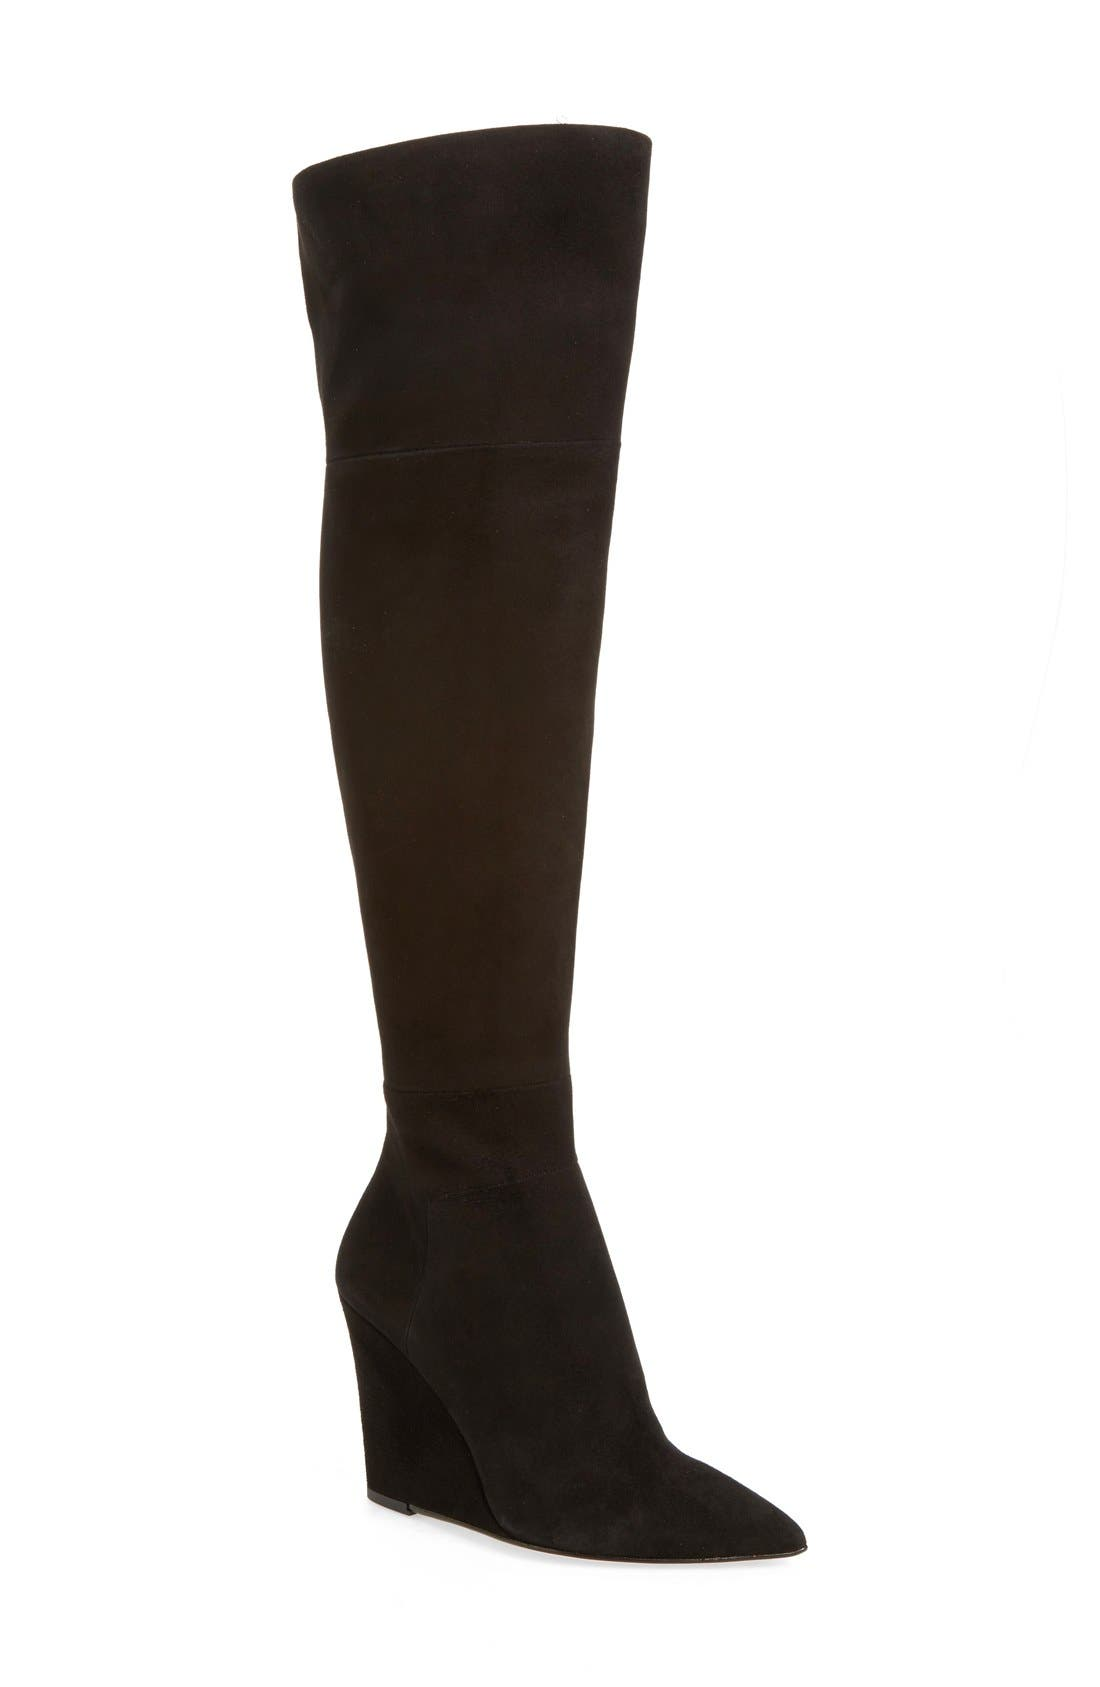 POUR LA VICTOIRE 'Serra' Over the Knee Boot, Main, color, 002